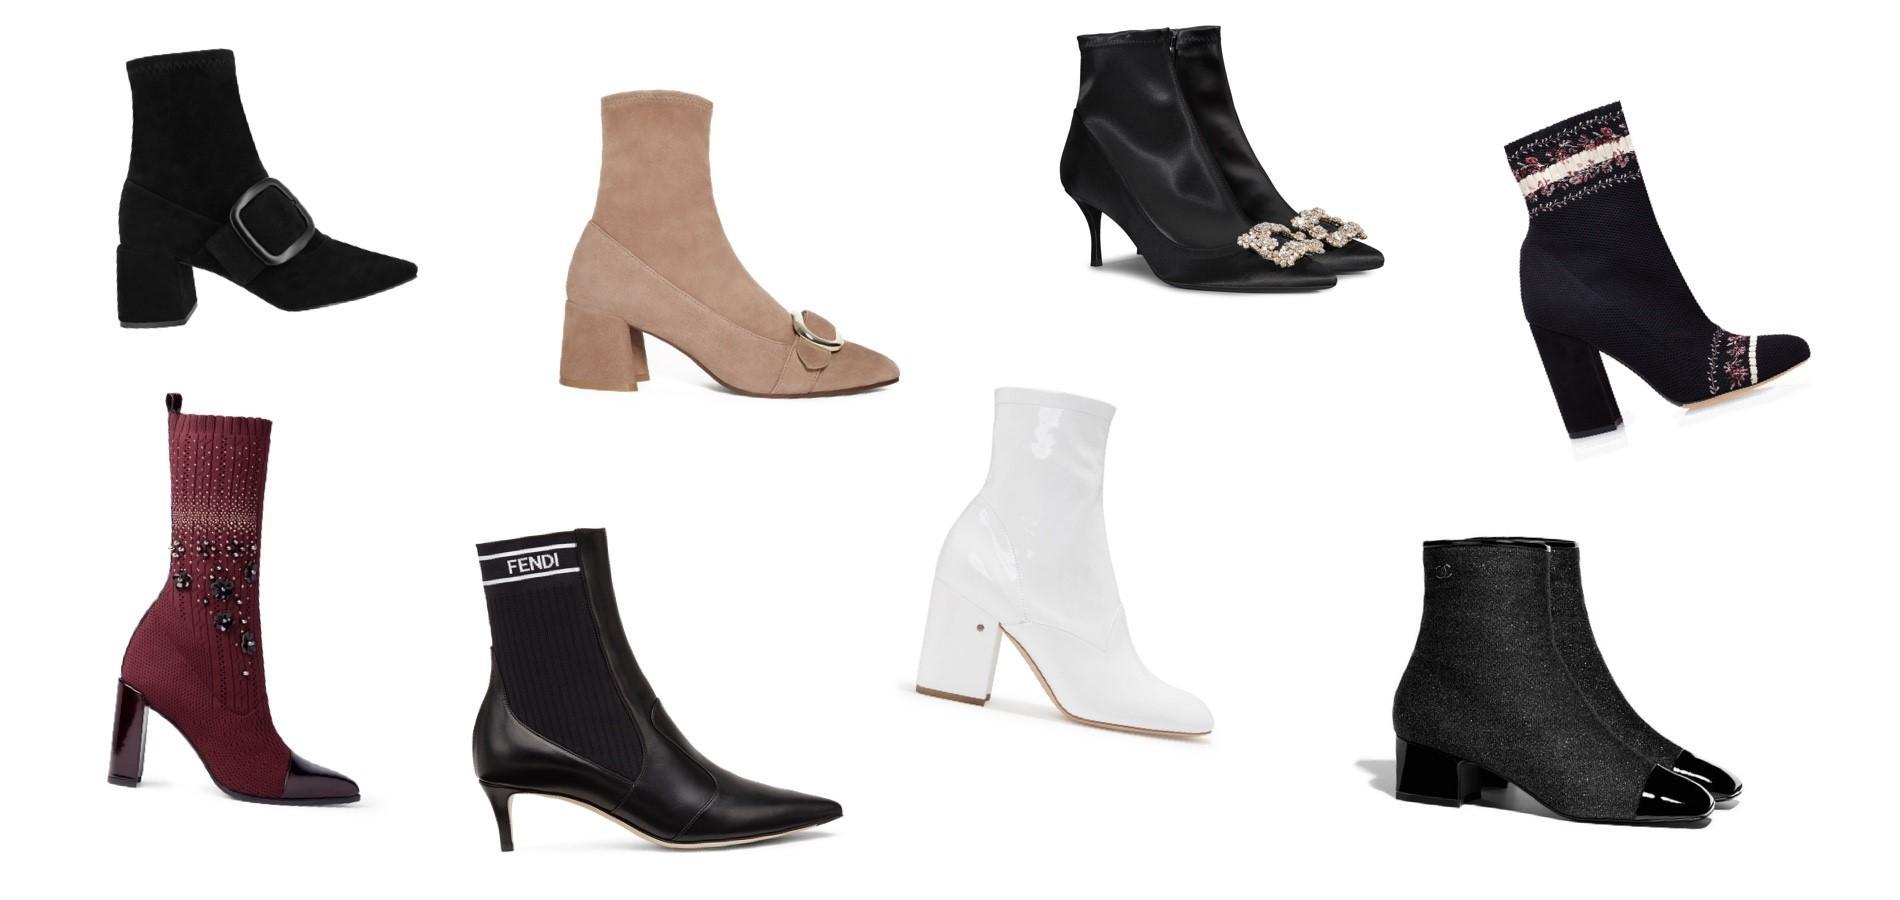 grandes marques marque populaire top design La bottine-chaussette, mode d'emploi - Madame Figaro